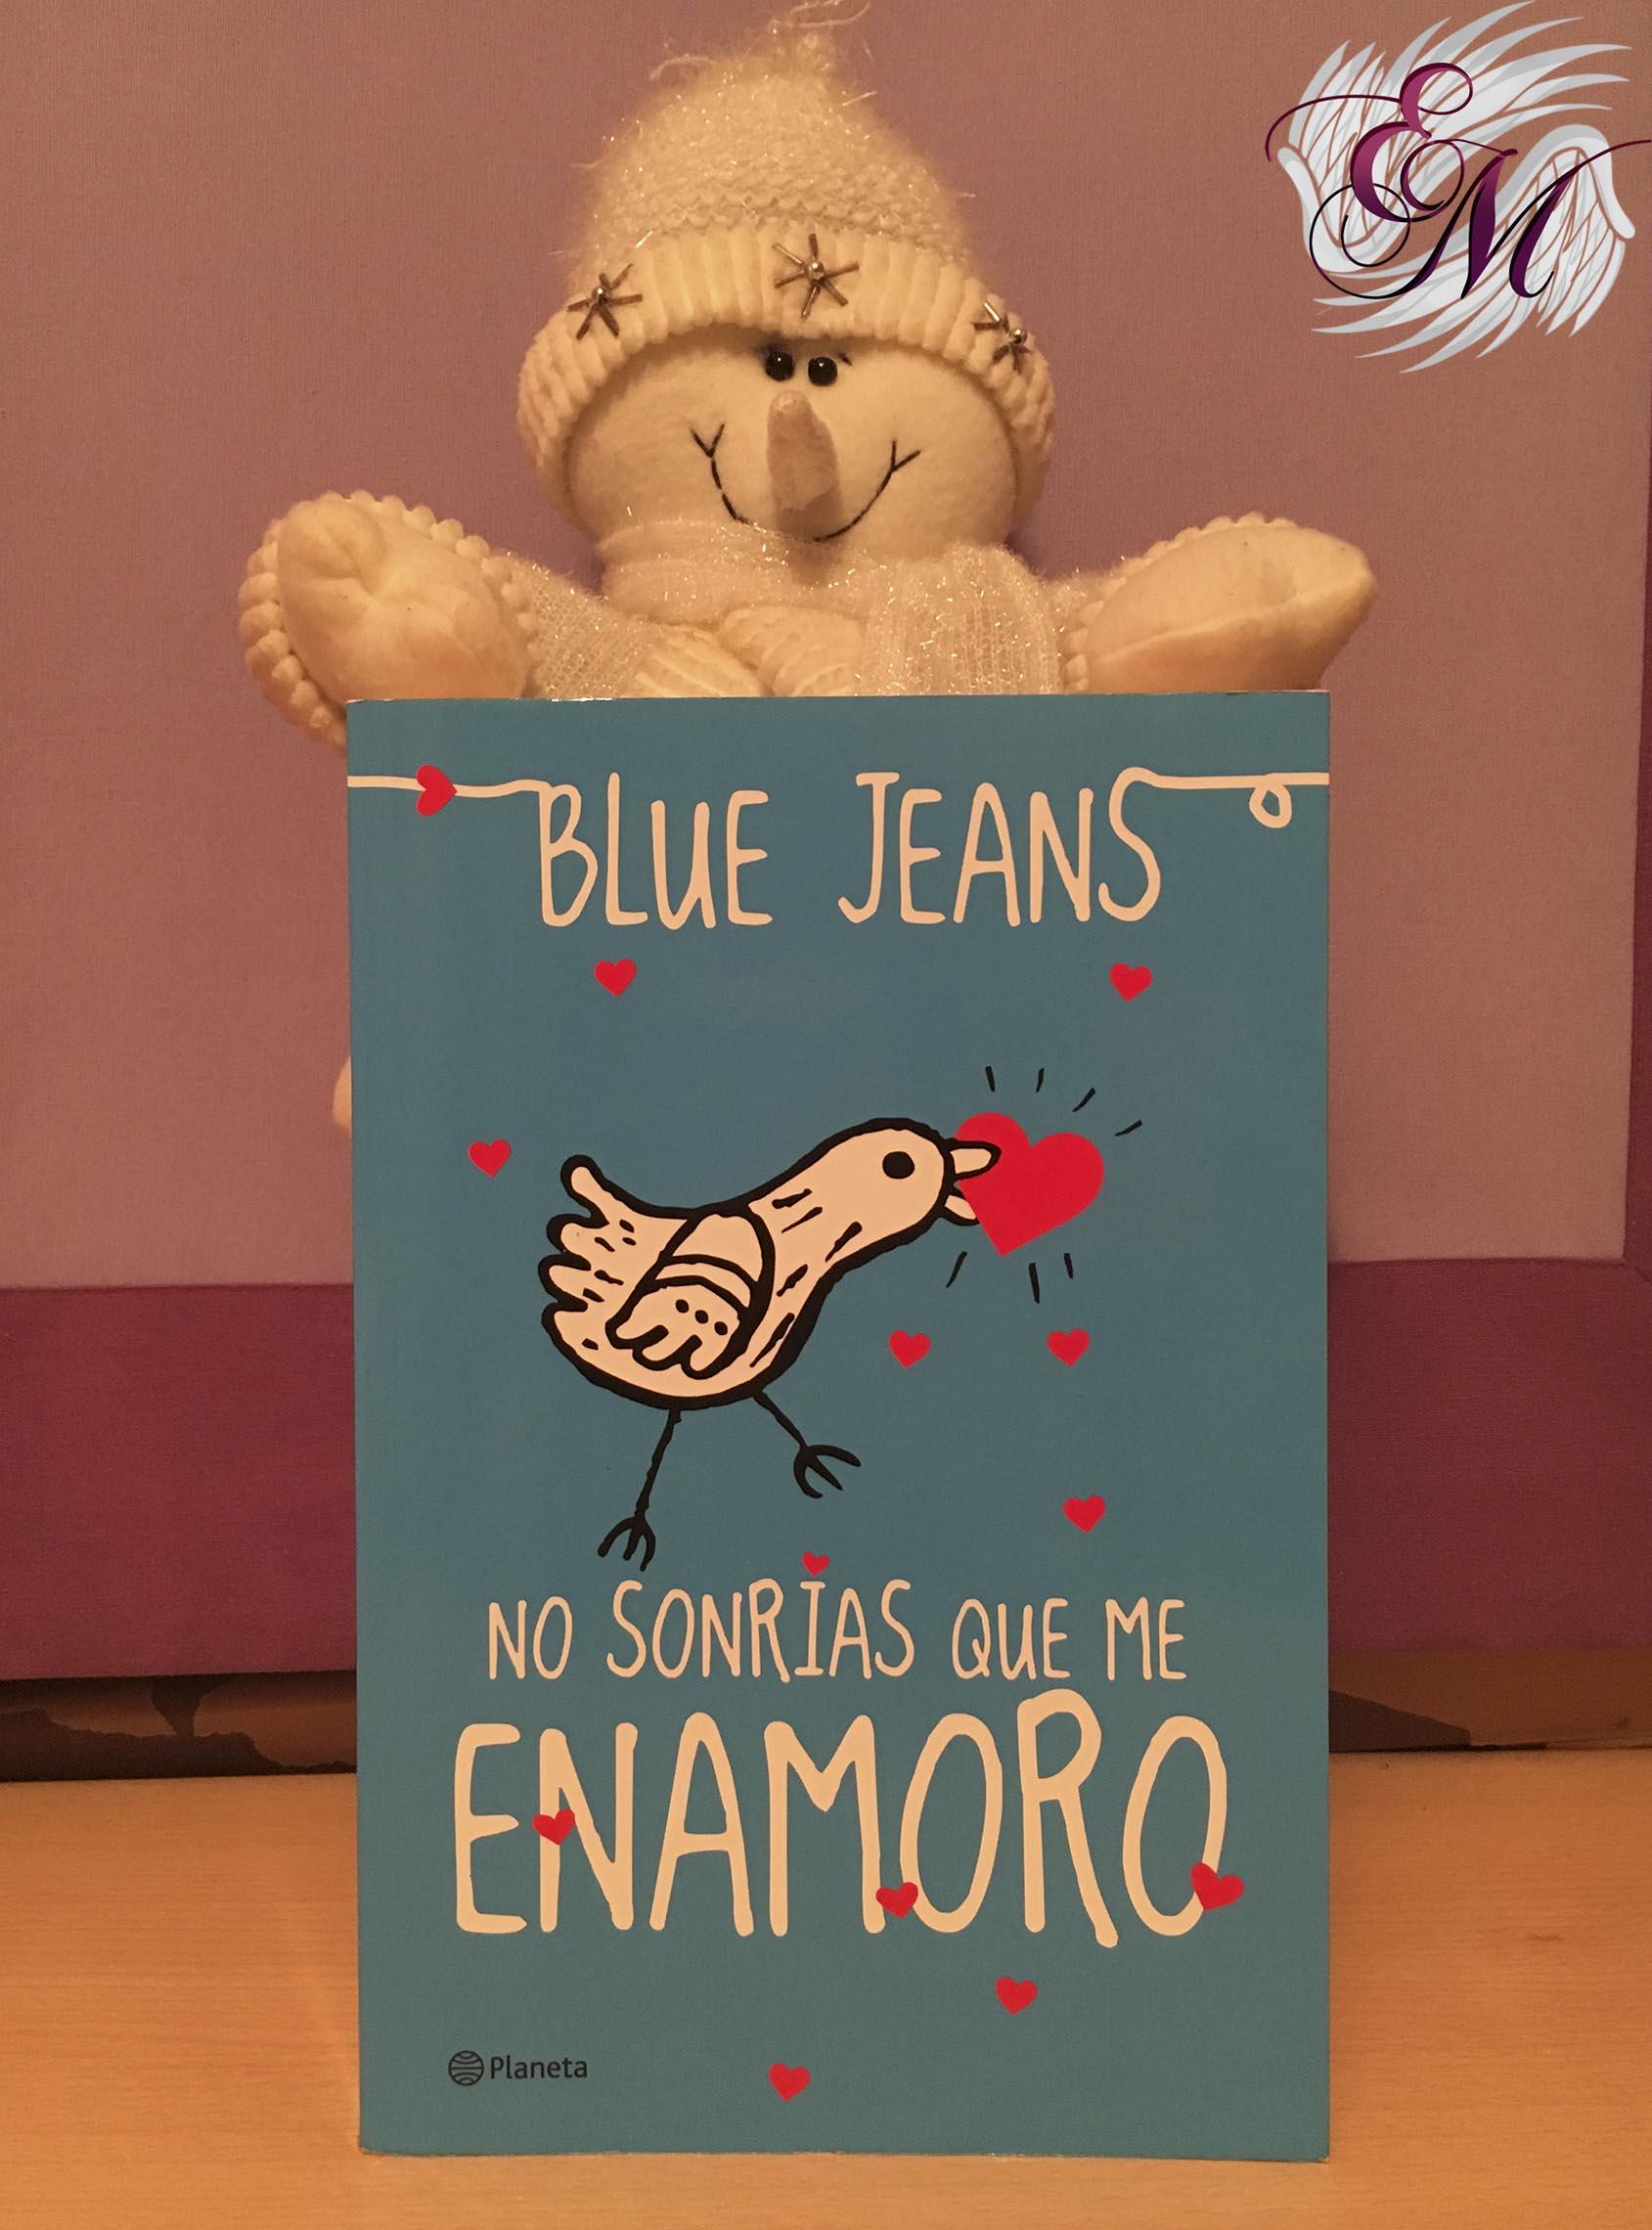 No sonrías que me enamoro, de Blue Jeans - Reseña